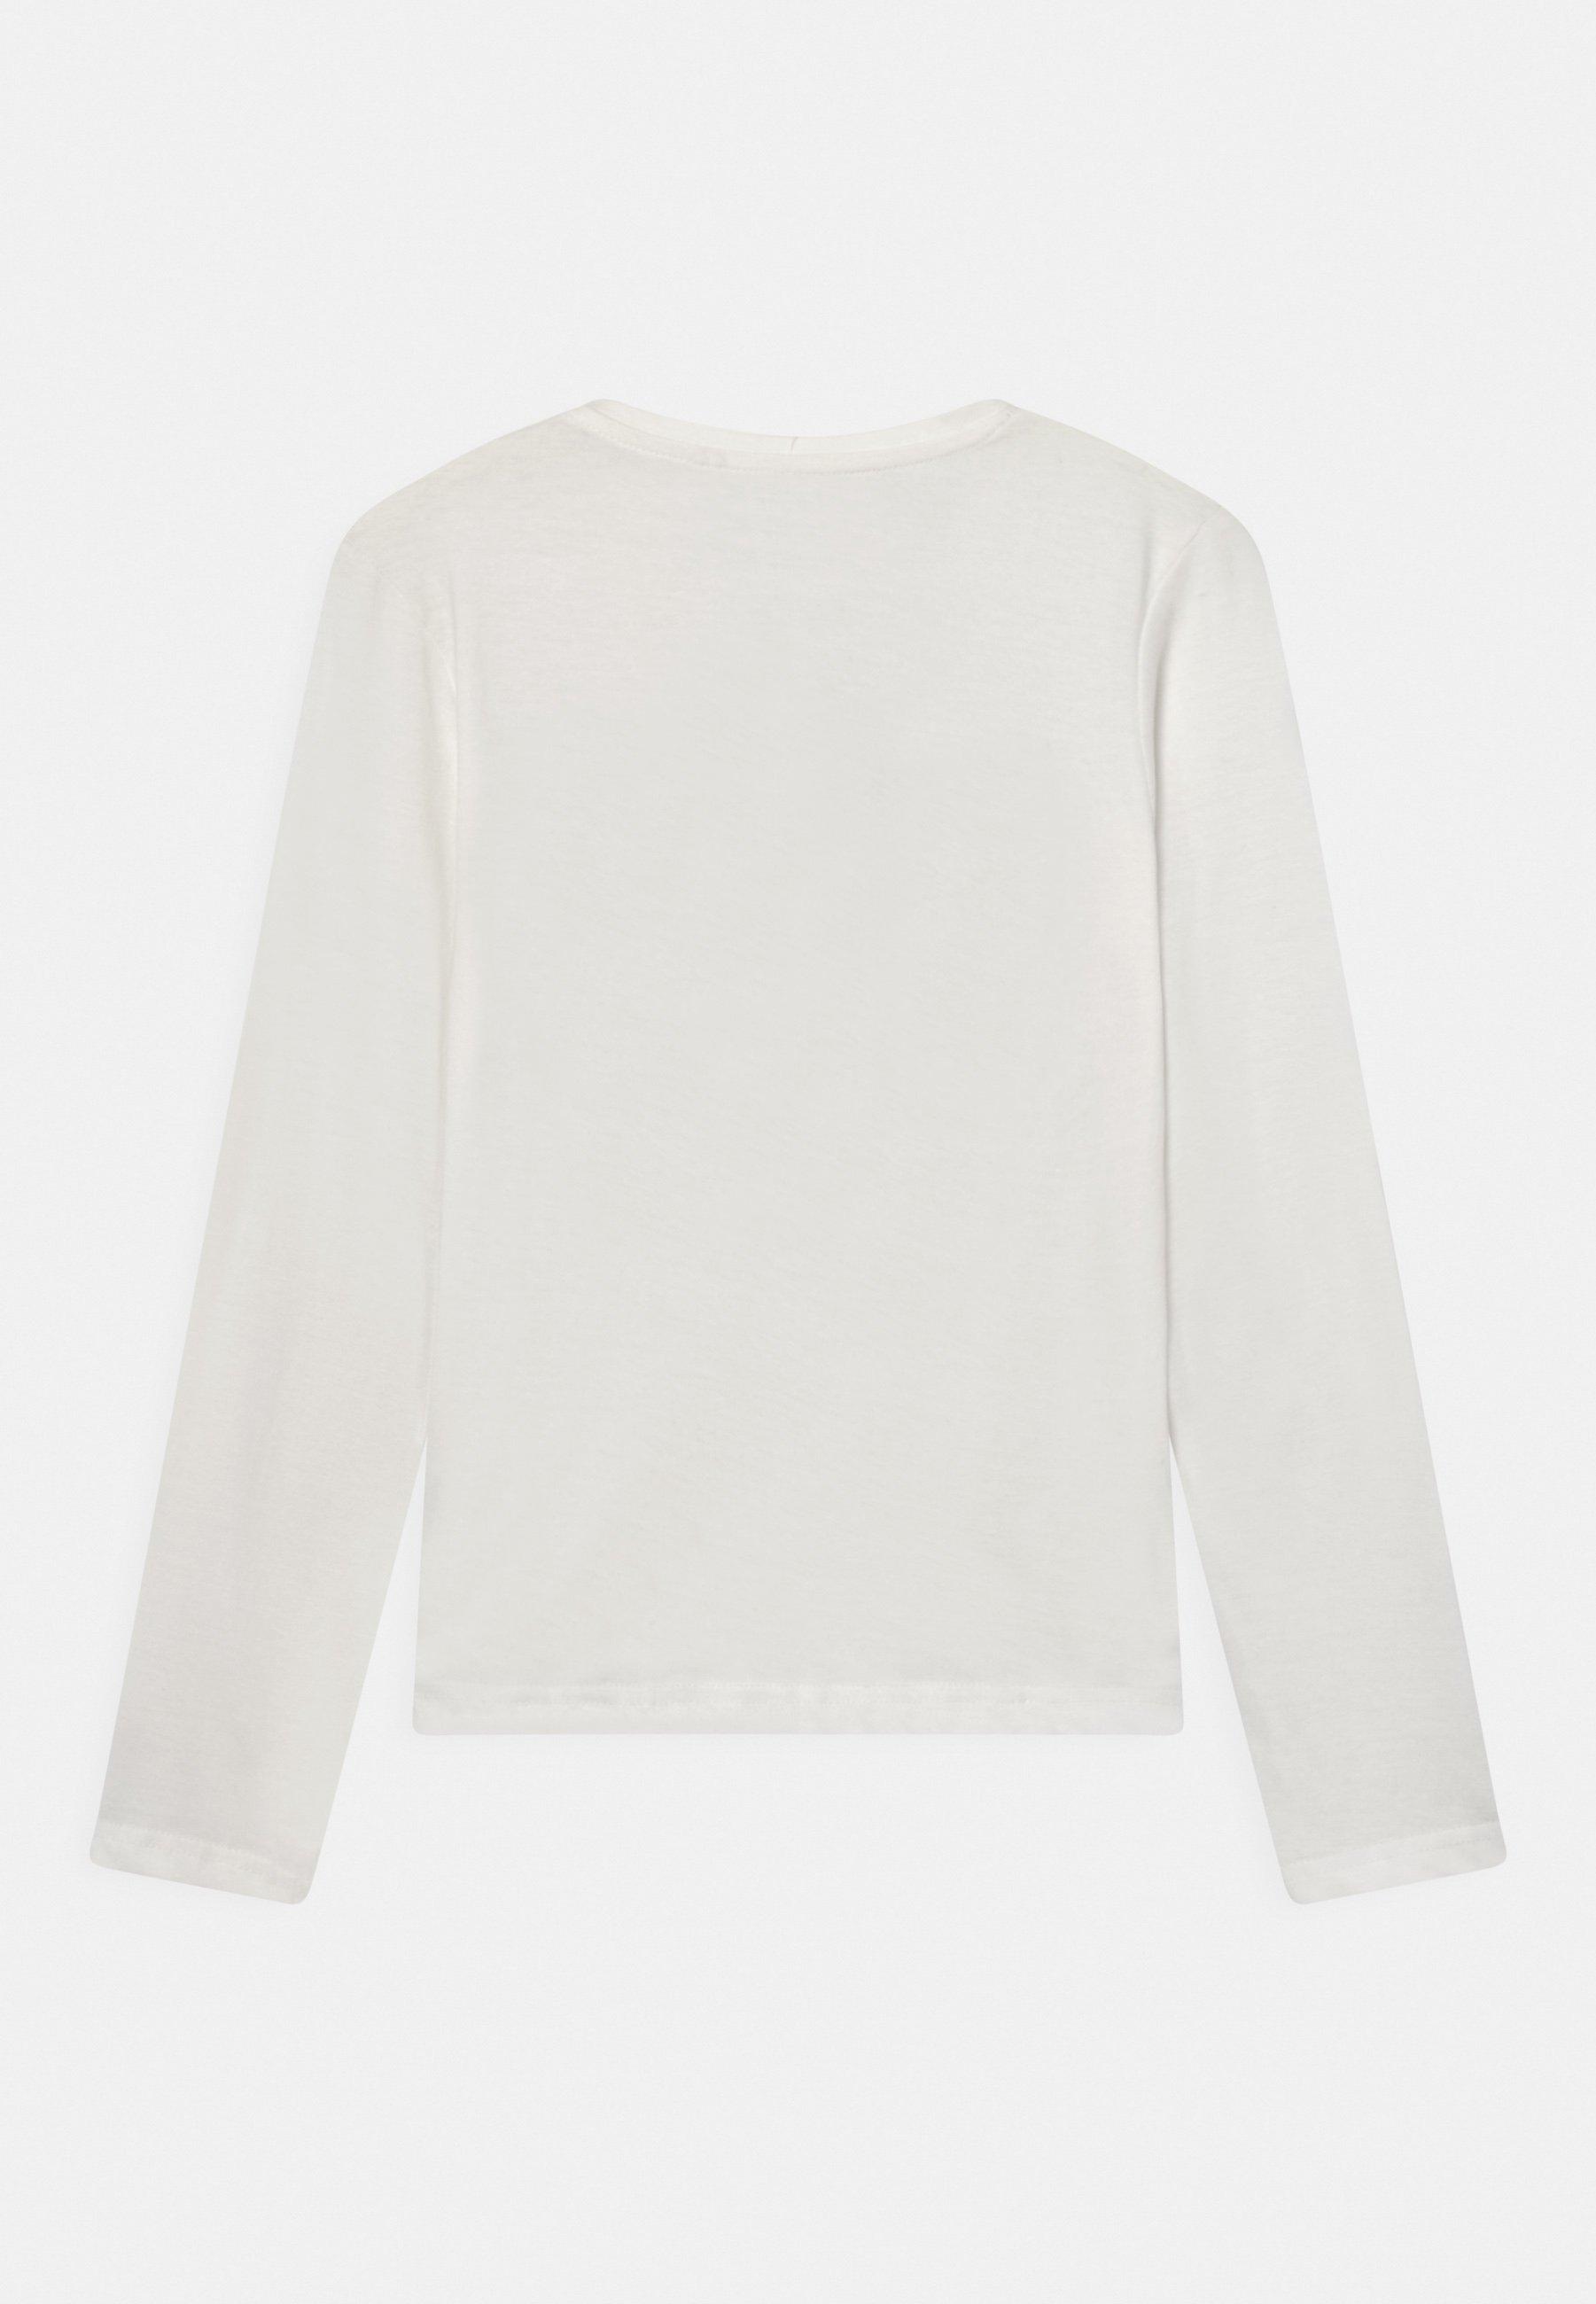 Kids GIRLS  - Long sleeved top - offwhite